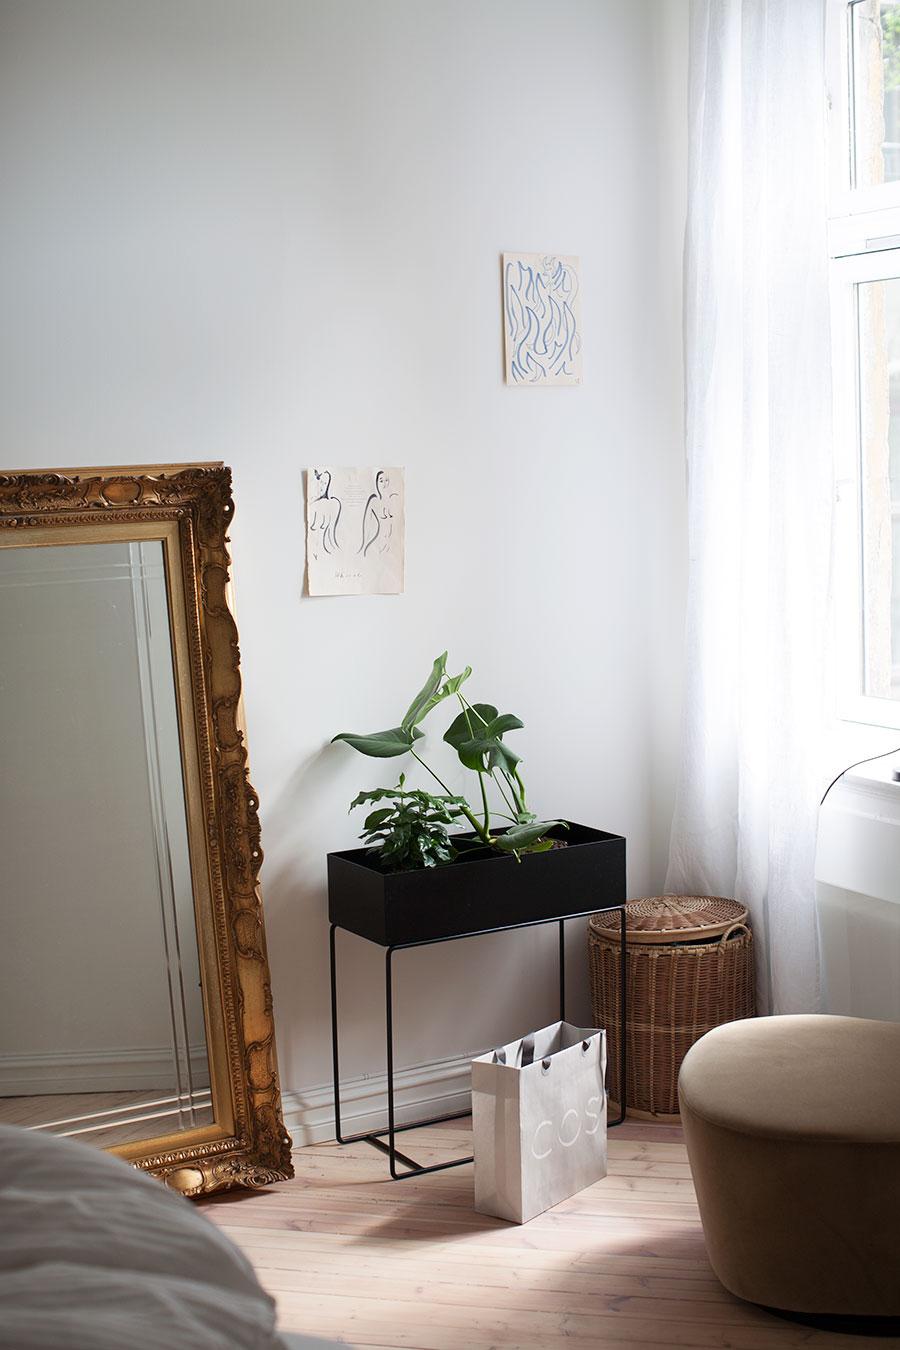 Soldøsig med ny stil Maja HattvangMaja Hattvang